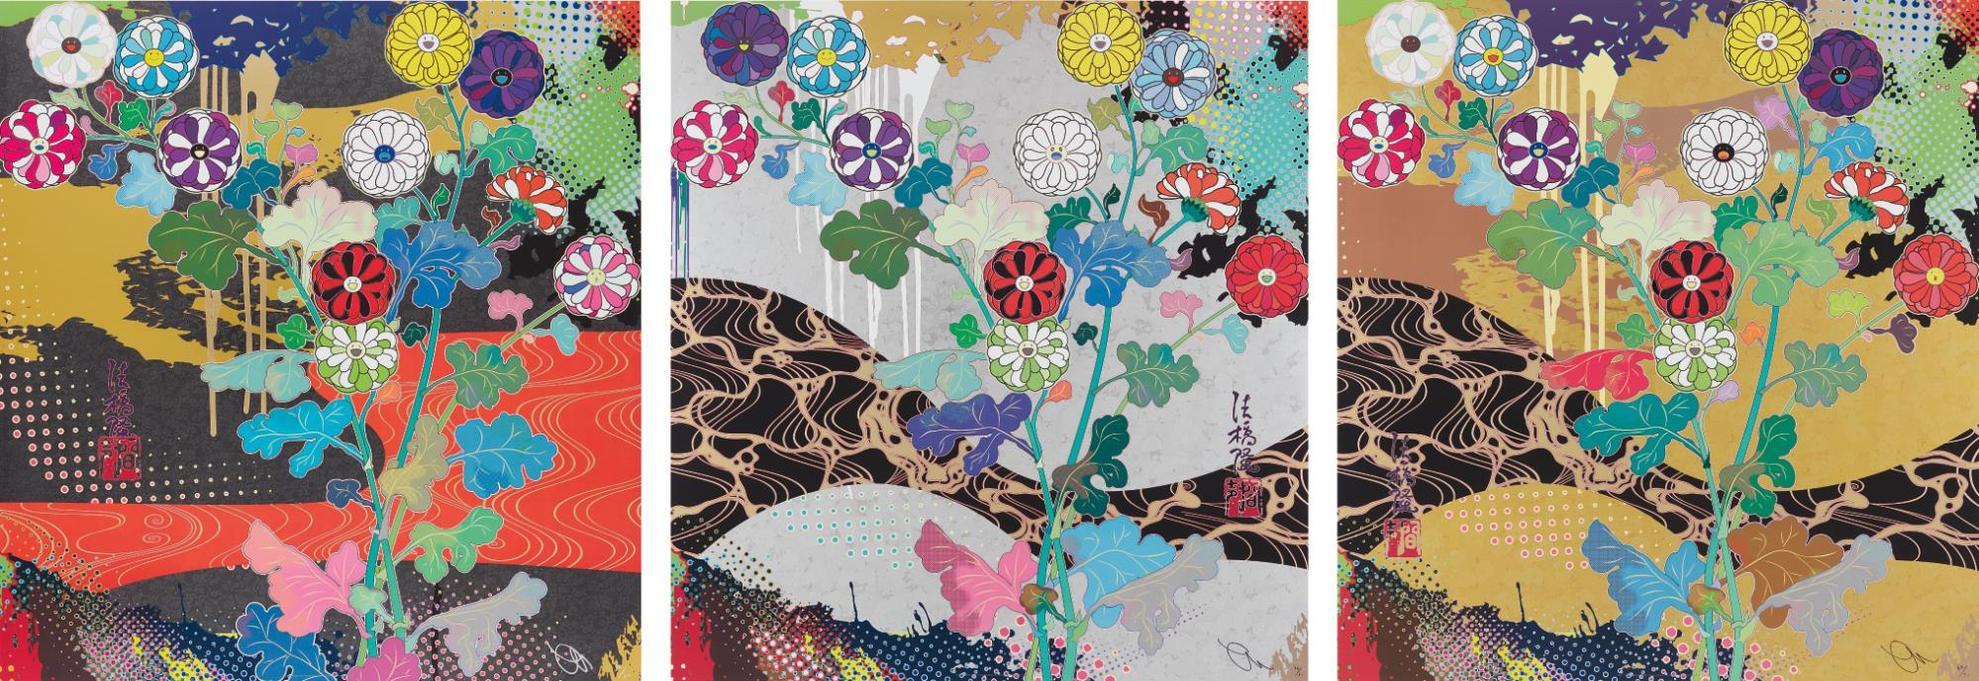 Takashi Murakami-Korin: Dark Matter; Korin: Pure White; And Korin: The Time Of Celebration-2015